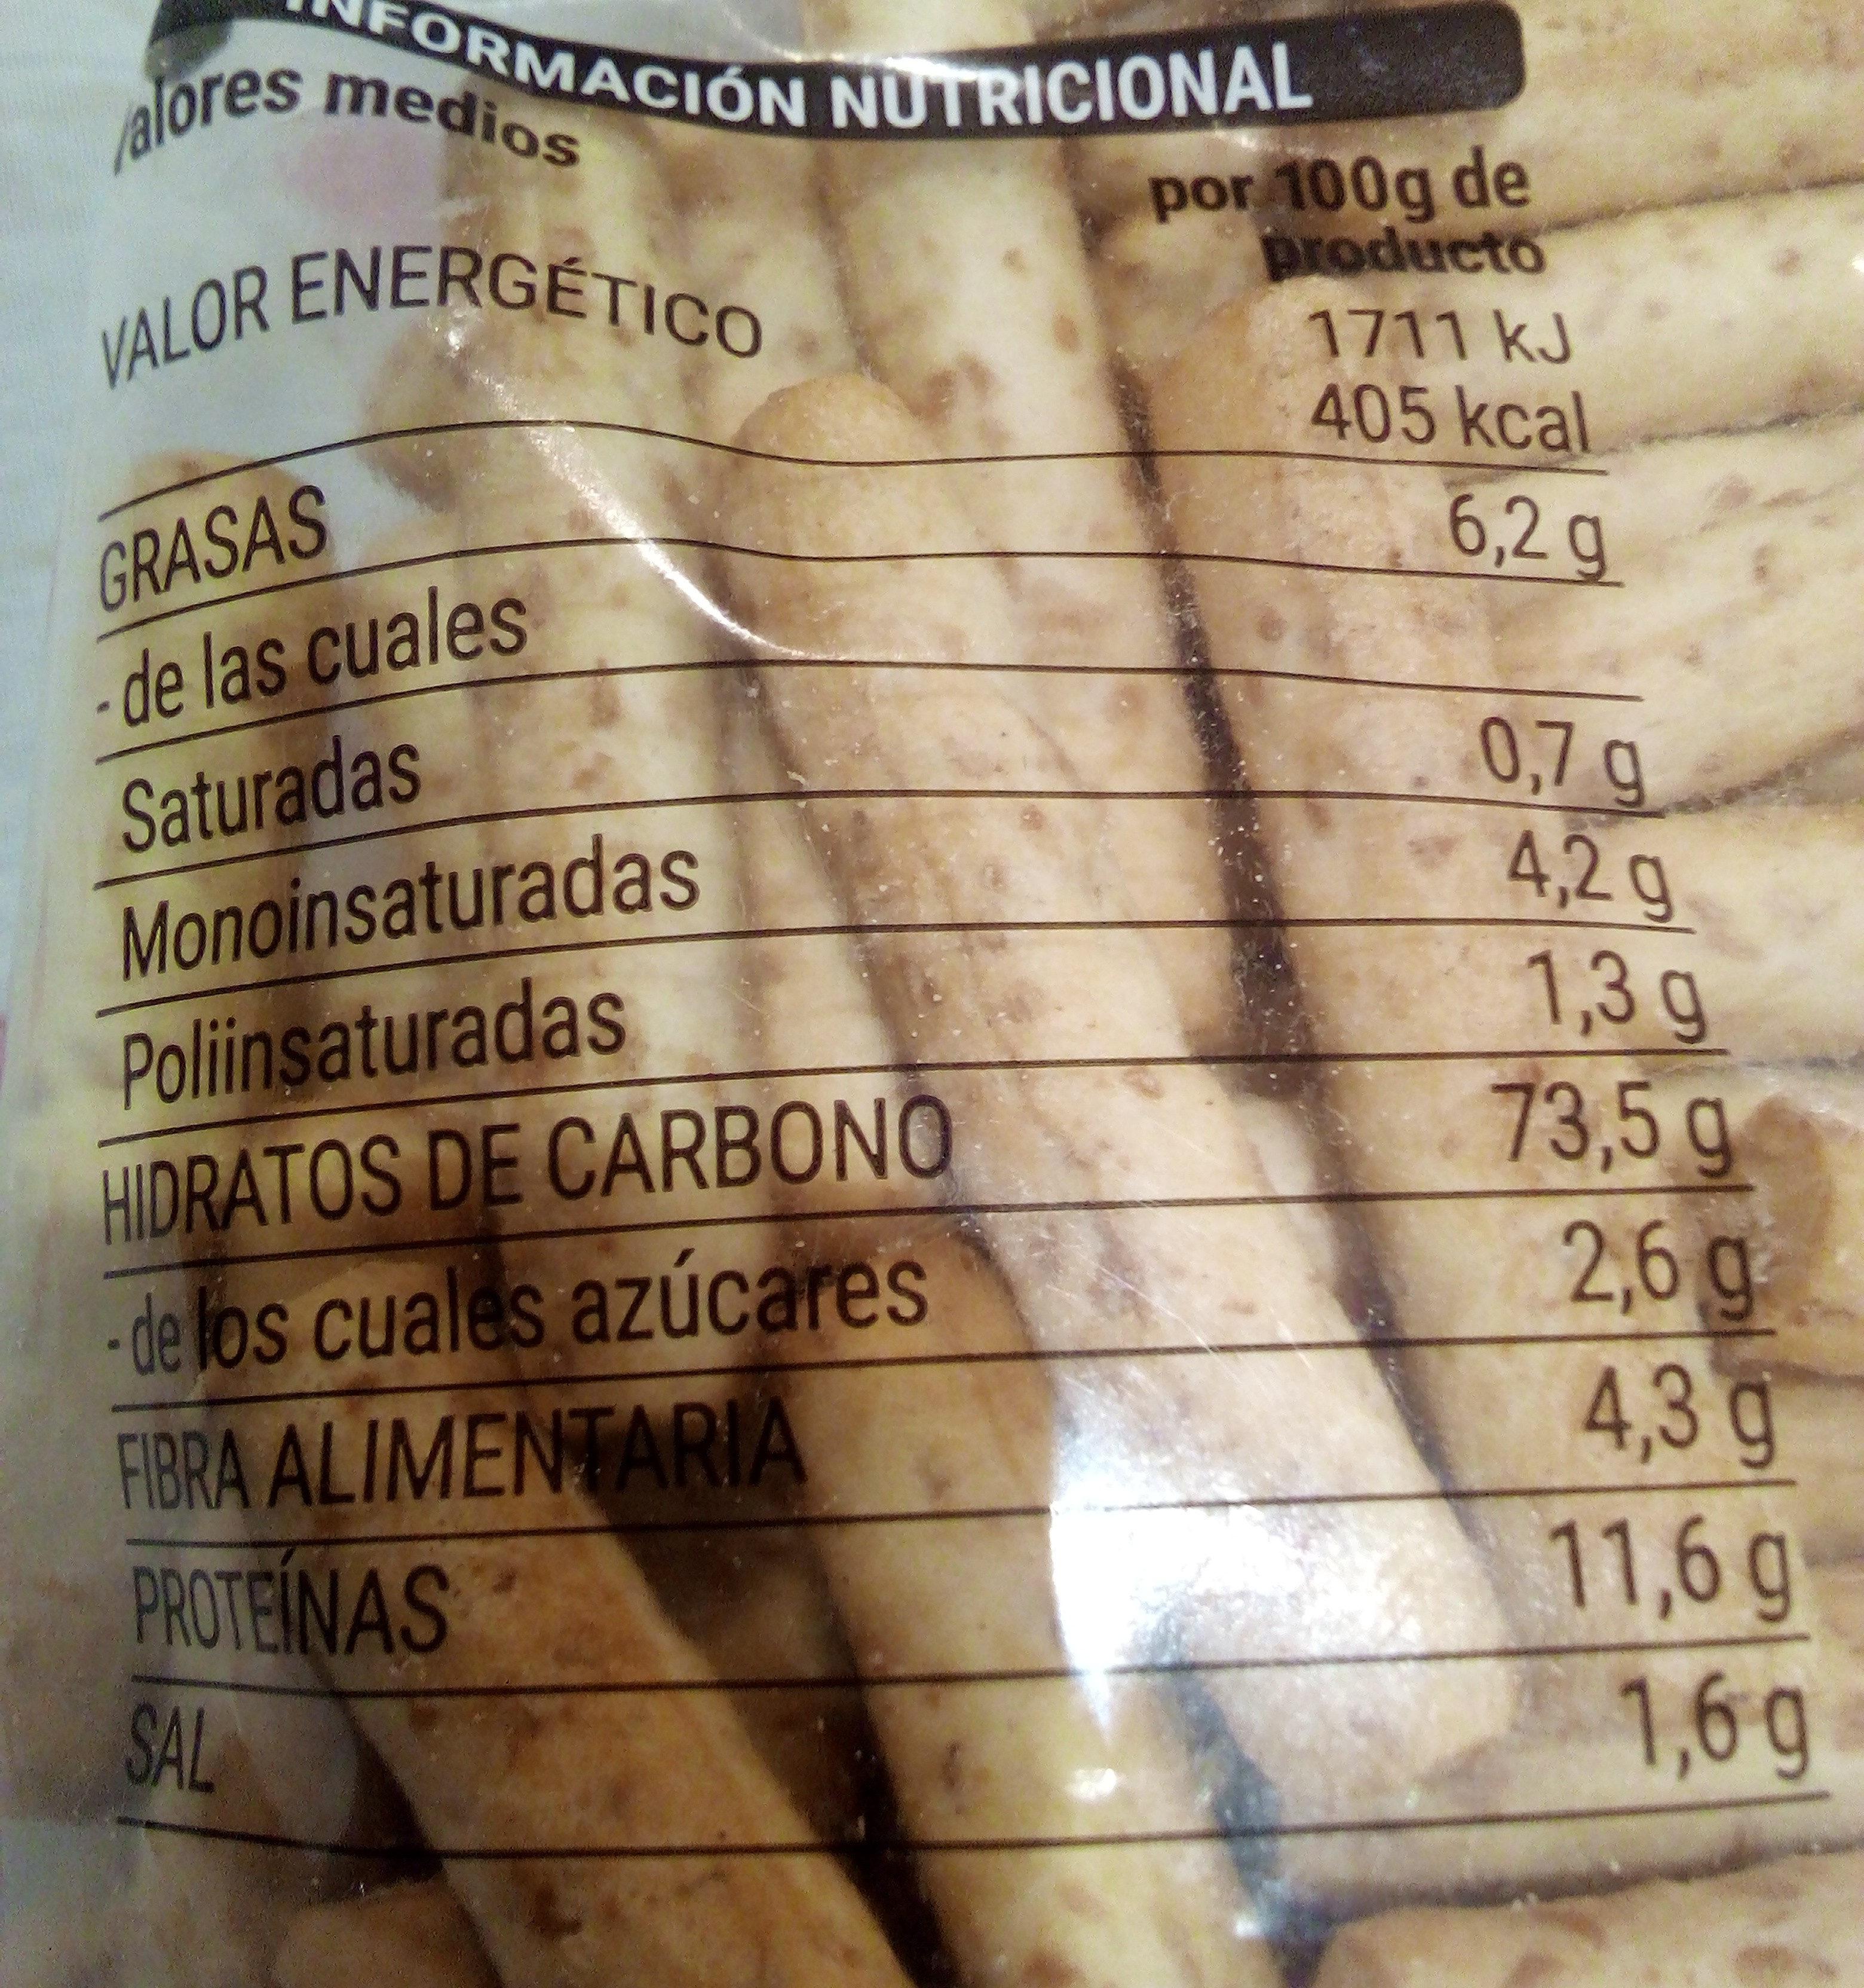 Picos integrales - Ingredients - es